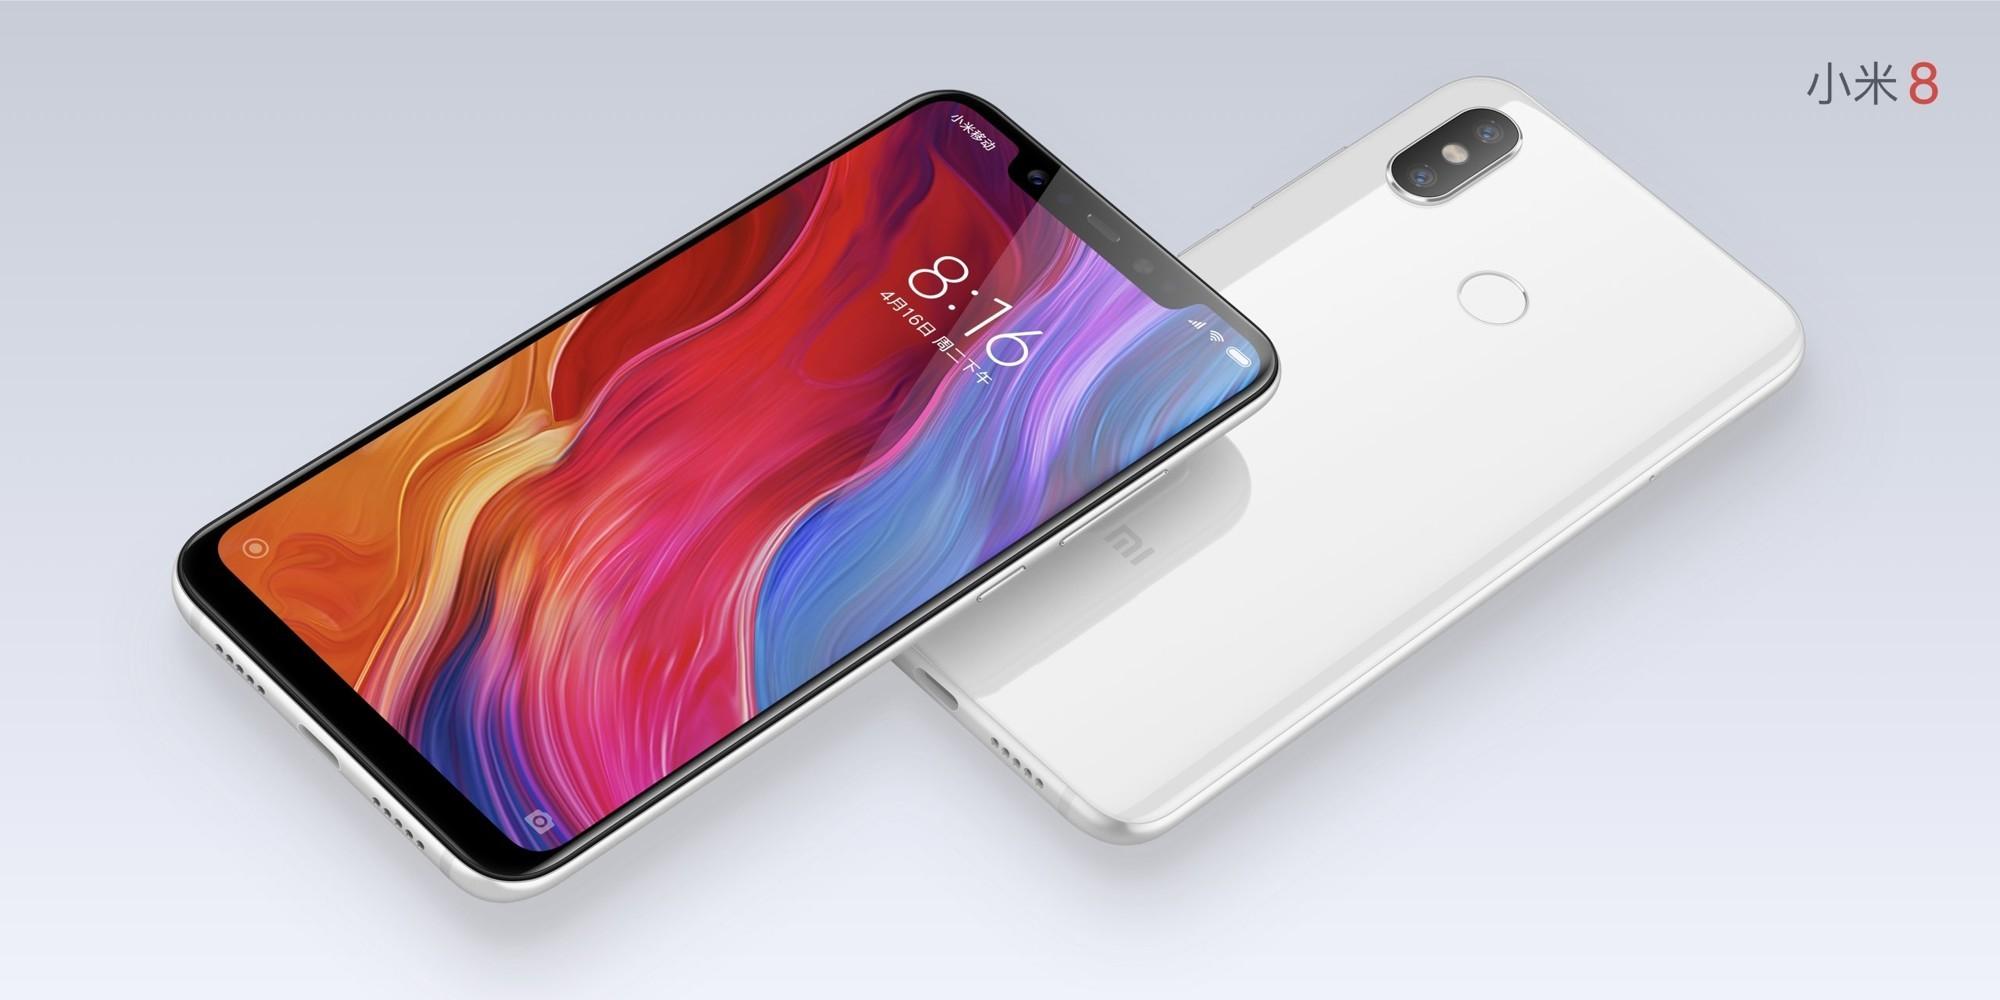 Xiaomi представила новый флагманский смартфон Mi8